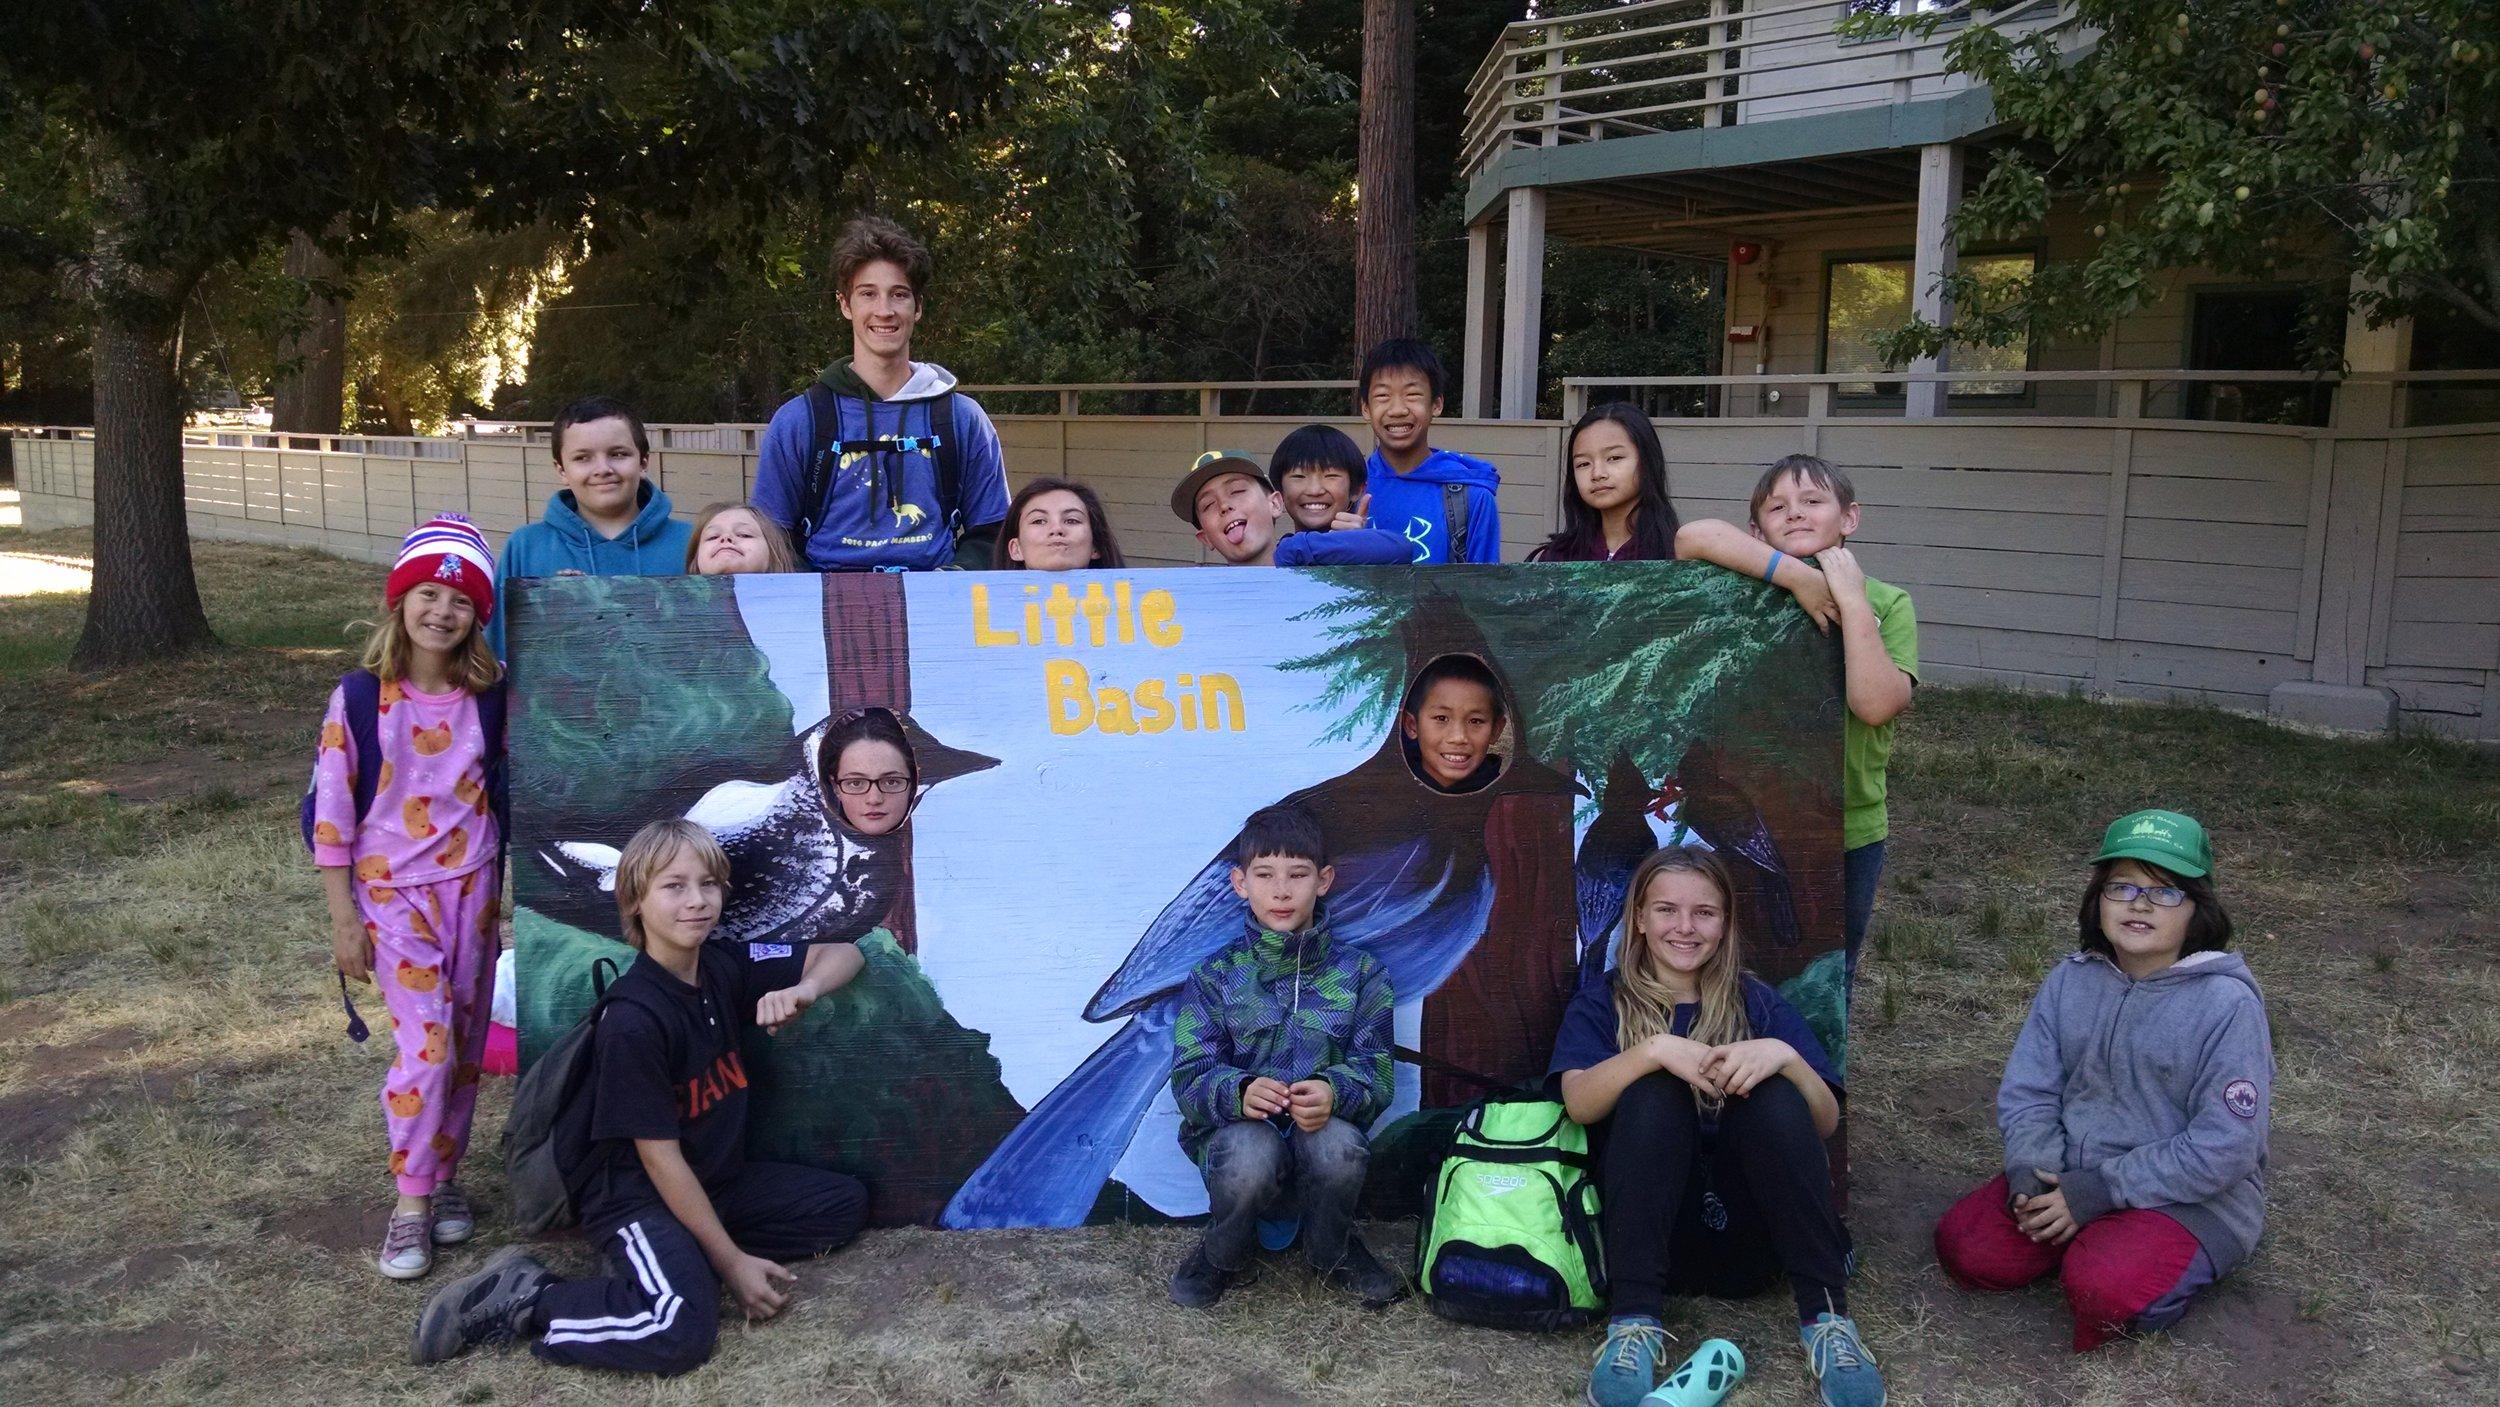 WOLF School Summer Nature Camp at Little Basin_Marbled Murrelet Mural.jpg